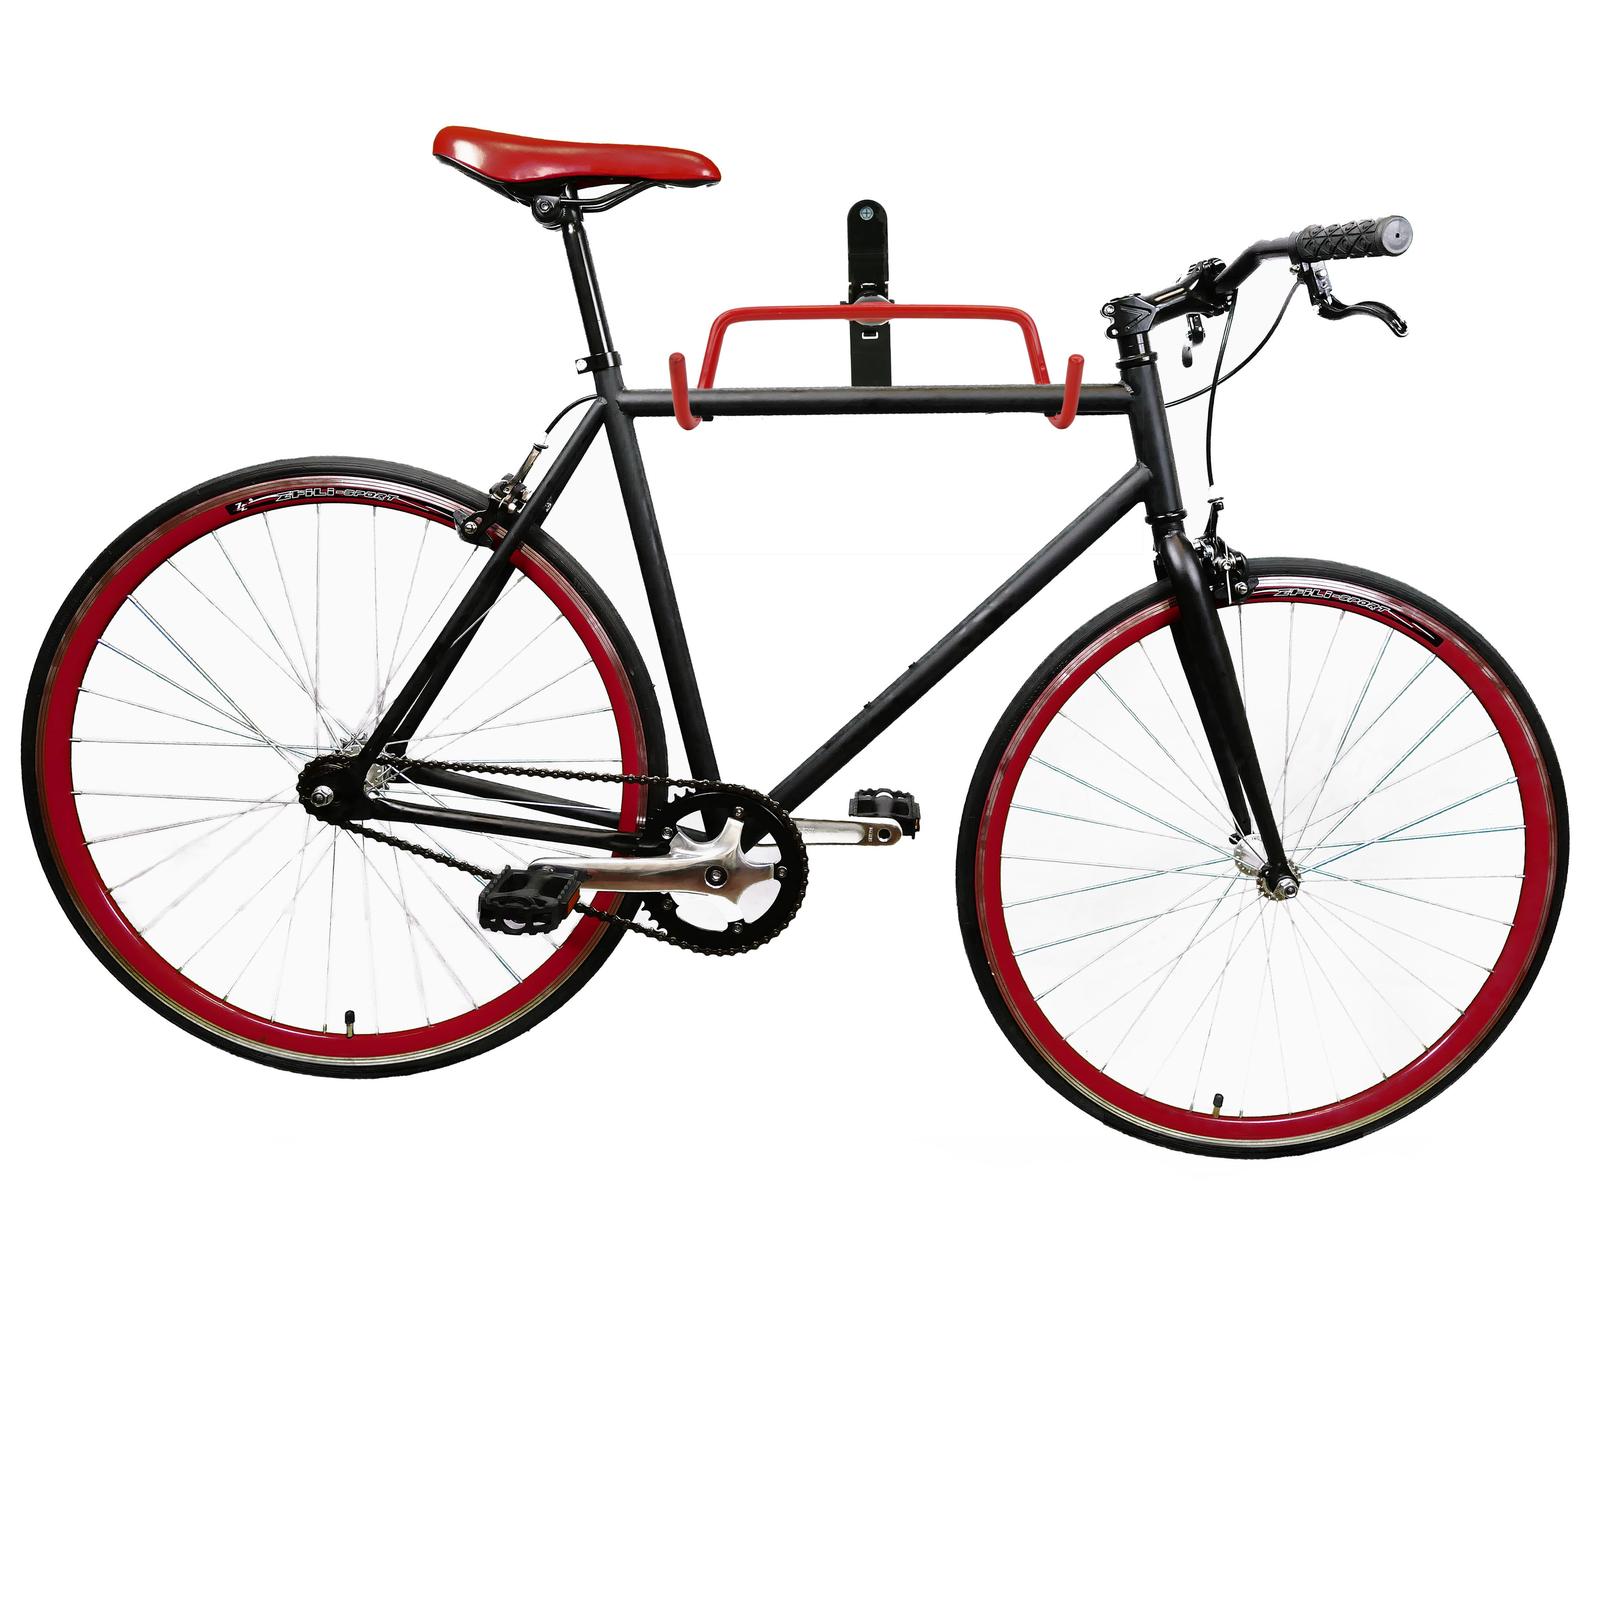 Bicycle Storage Hooks Wall Mount Bike Cycle Hanger Bracket Cycle Hanging K